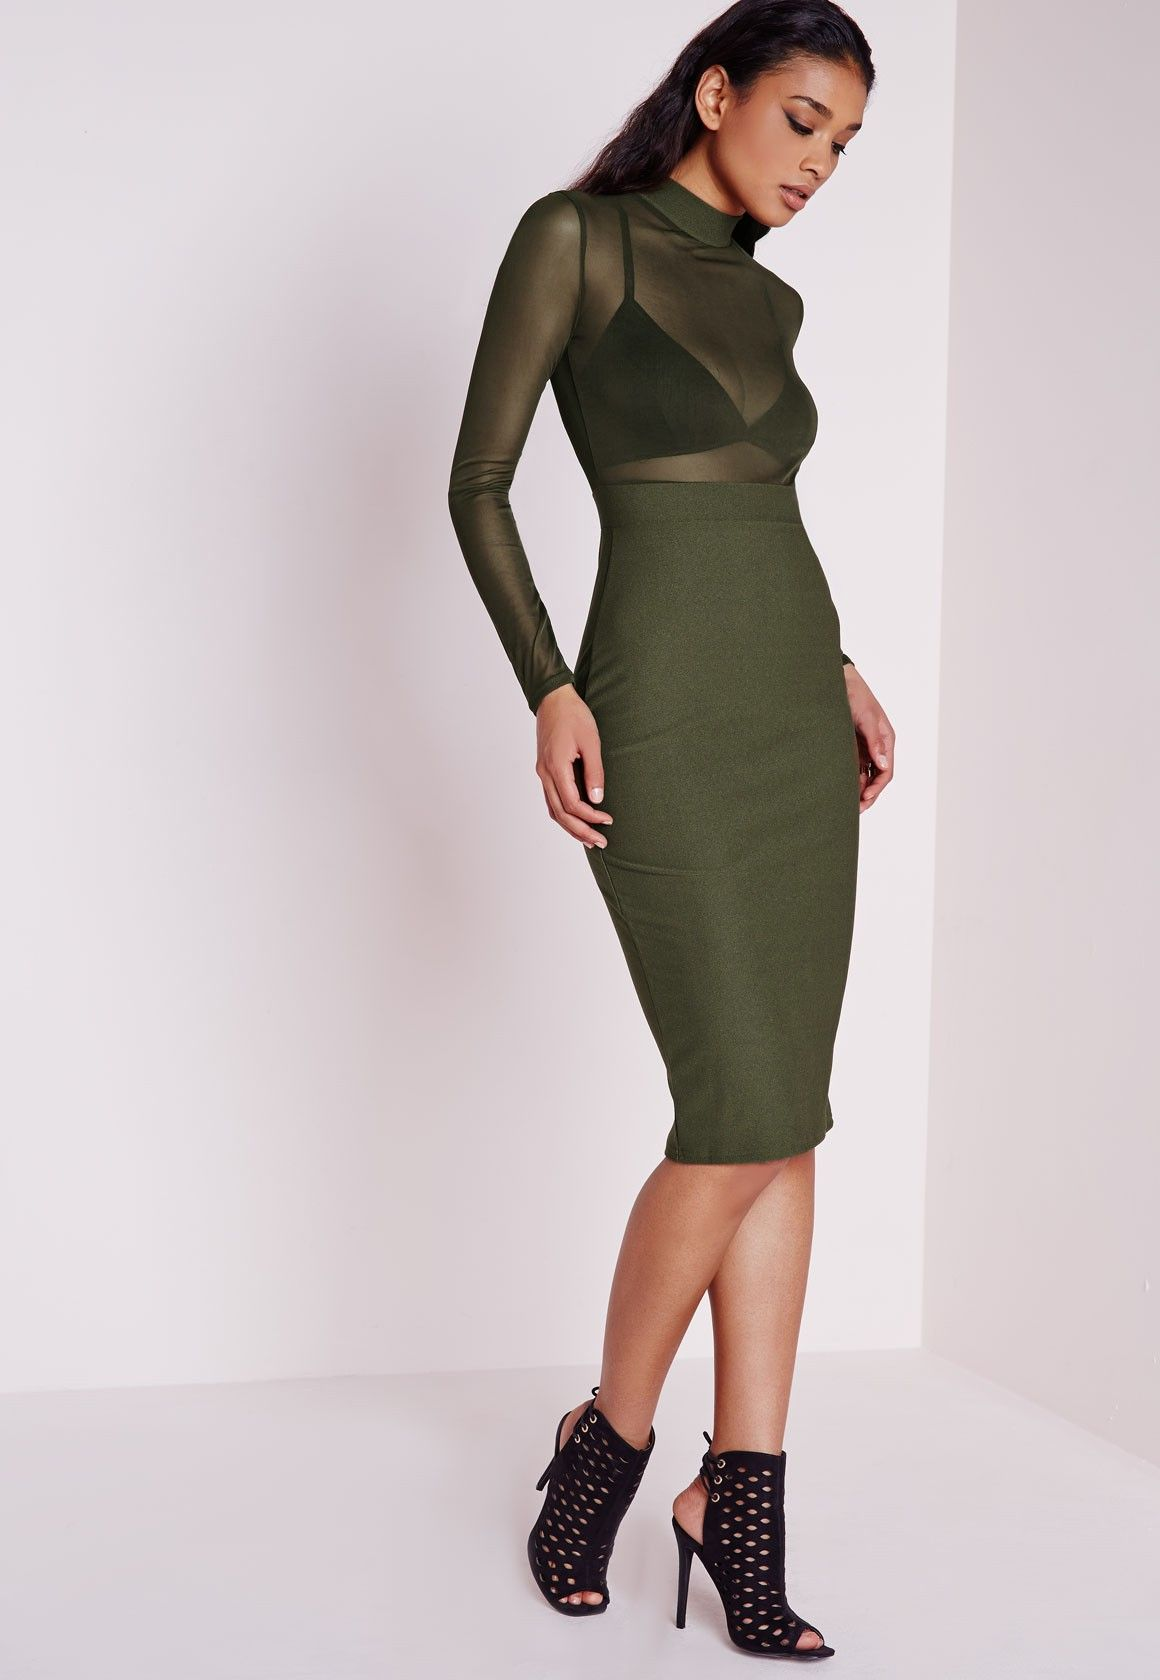 0cb24e9921a6f9 Missguided - Long Sleeve Mesh Top Midi Dress Khaki   Women's Fashion ...